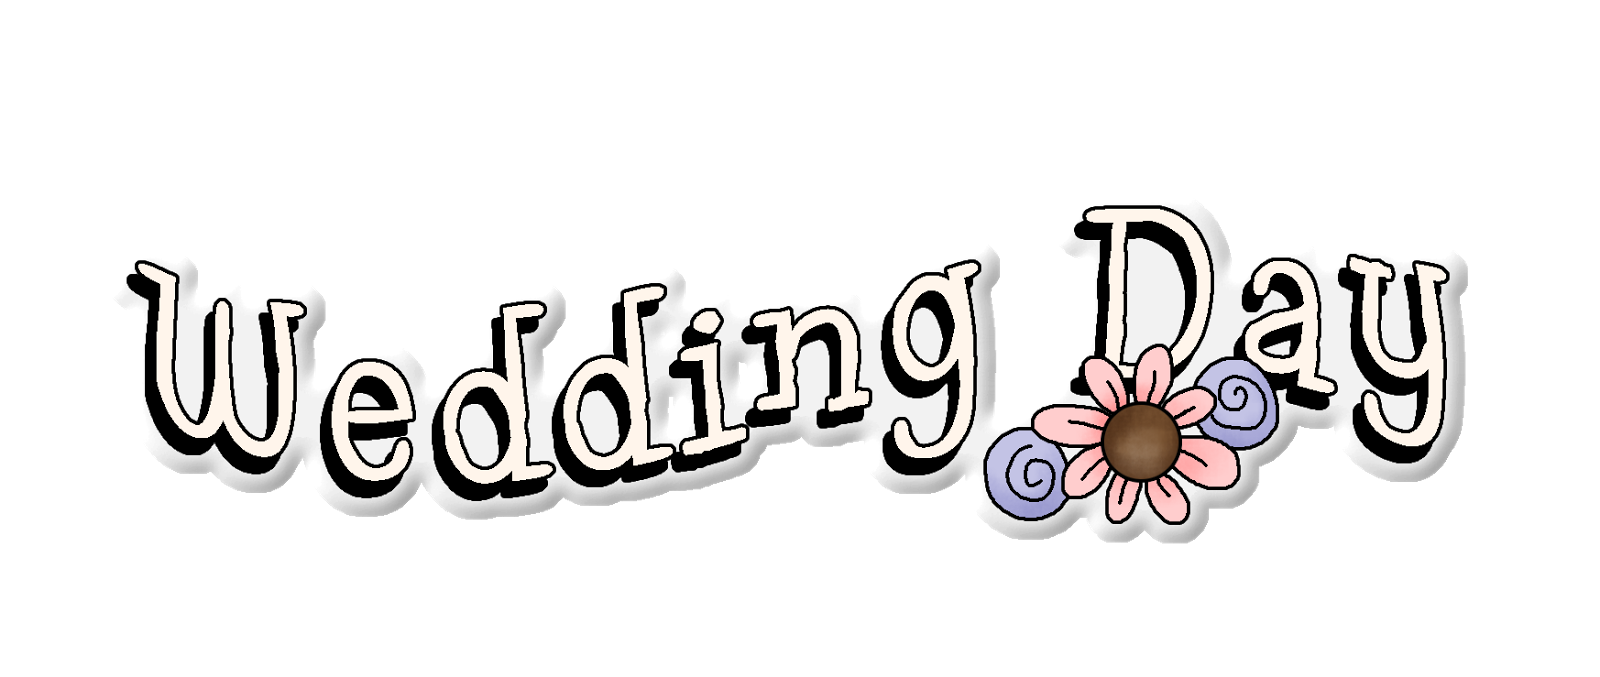 Wedding Day Clip Art.